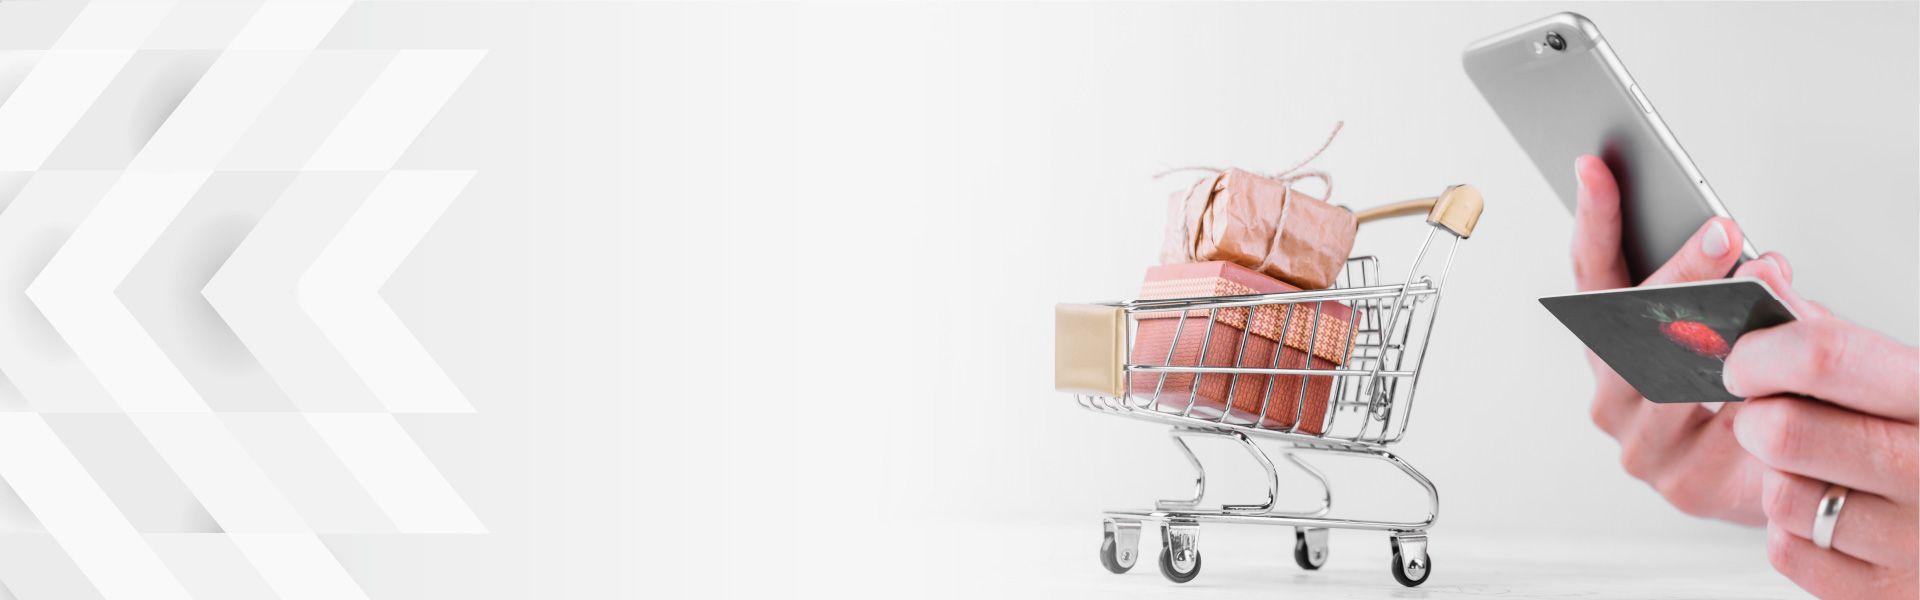 Compra en línea-img-md